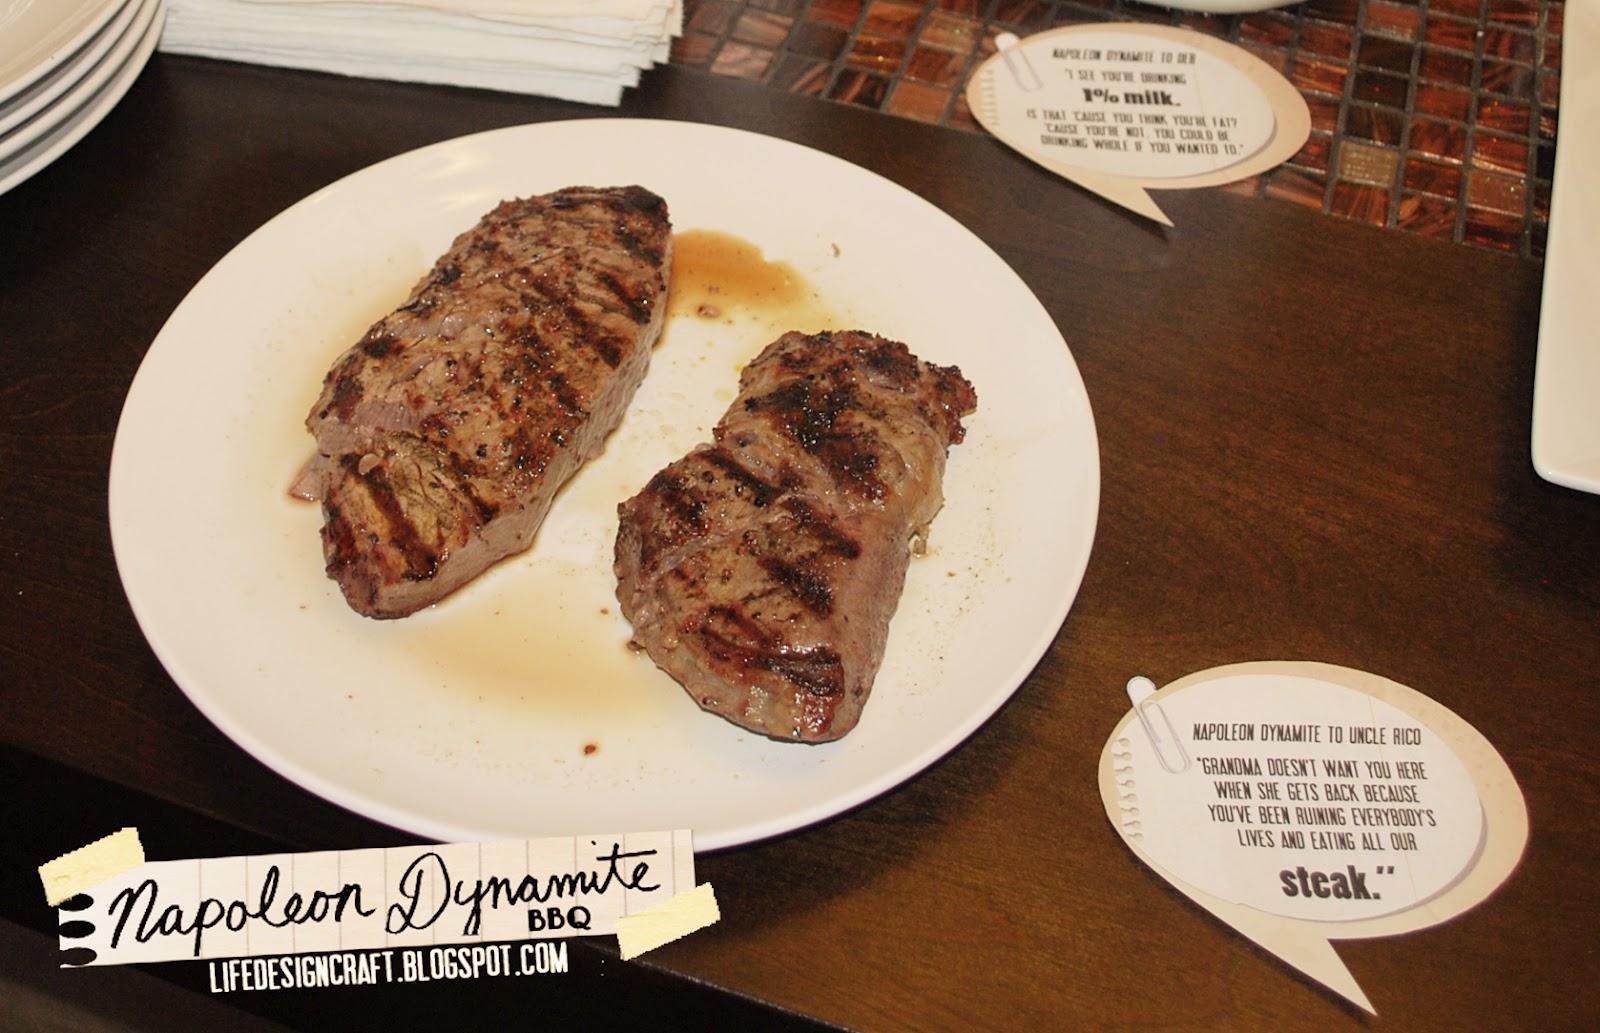 Fried Food Quotes Quotesgram: Quotes About Steak. QuotesGram